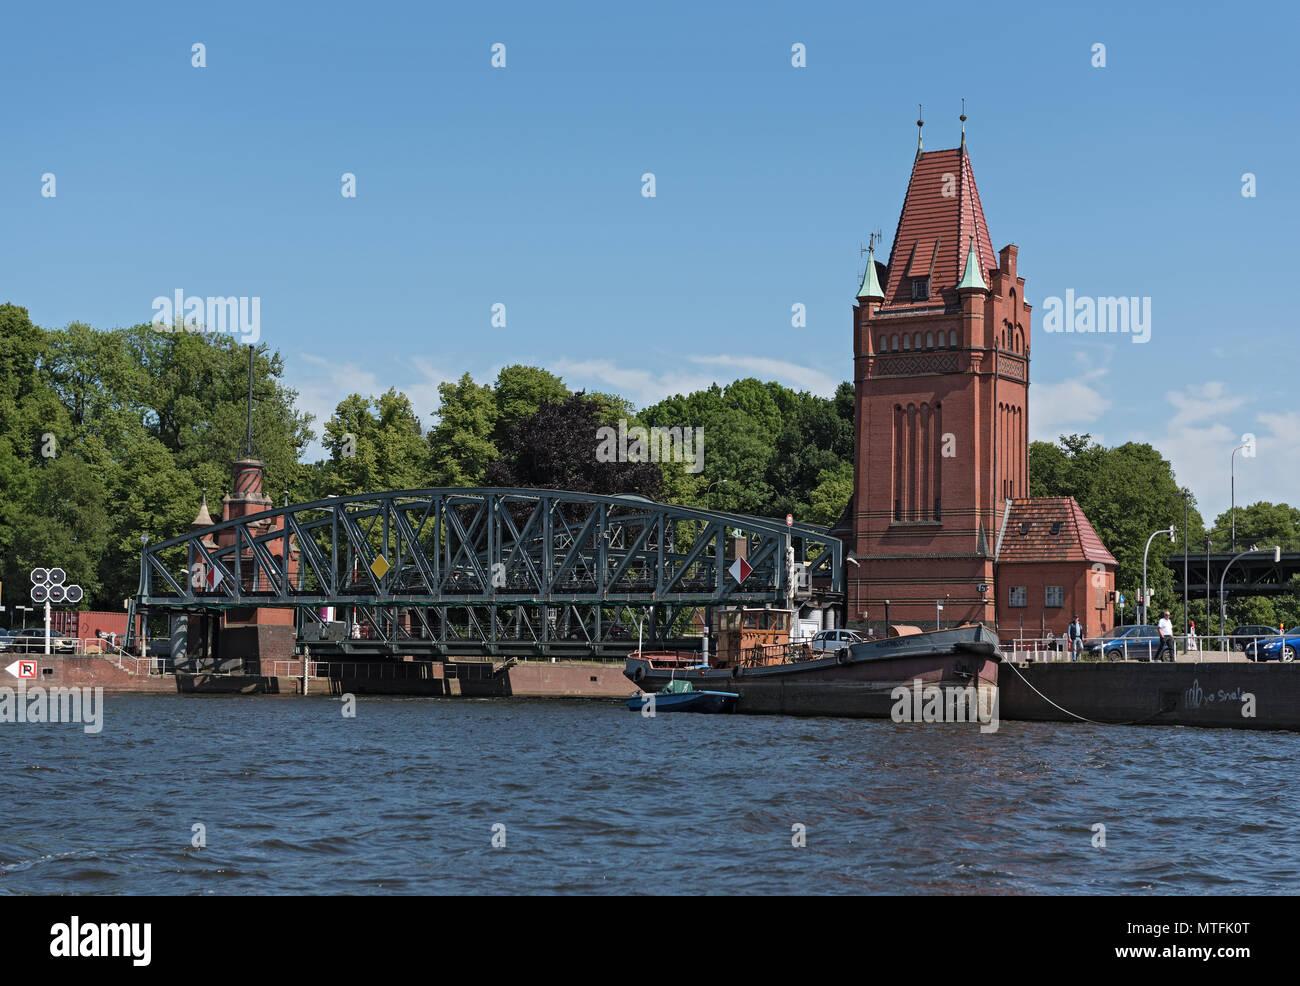 View of the historic lift bridge (Marstallbrucke) in Lubeck, germany - Stock Image